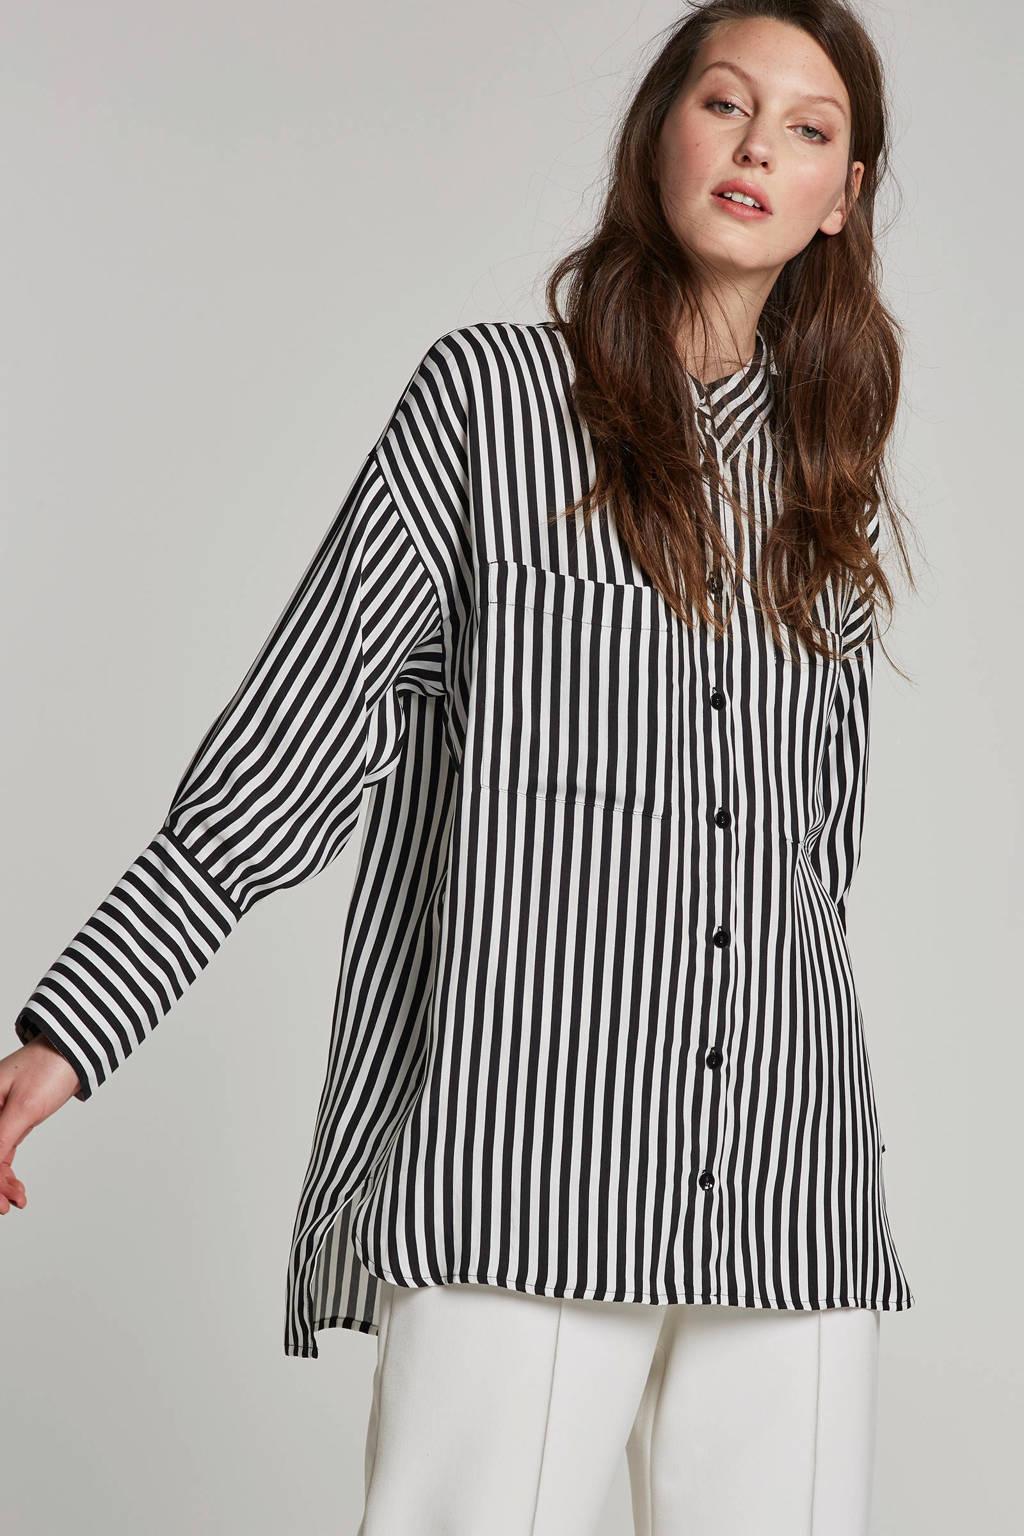 Summum Woman gestreepte oversize blouse, Zwart/wit